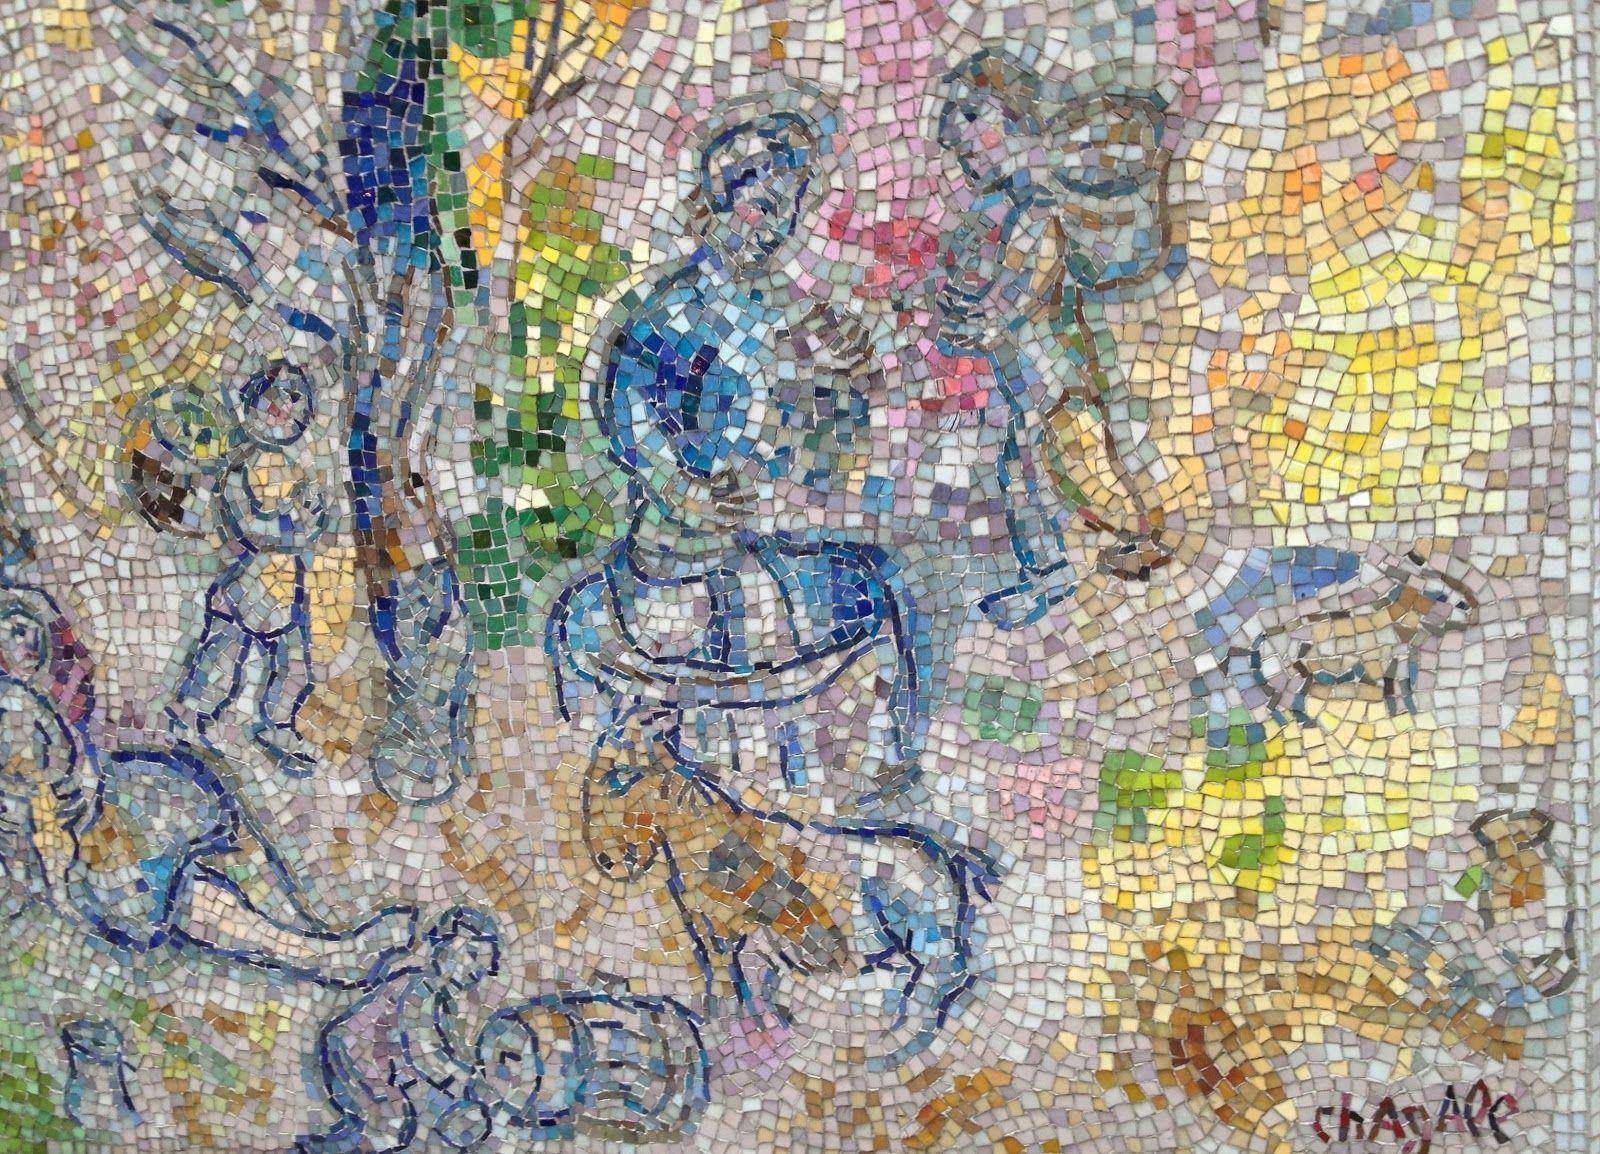 Four Seasons Chicago Map Marc Chagall | Mosaics | Marc chagall, World map art, Mosaic artwork